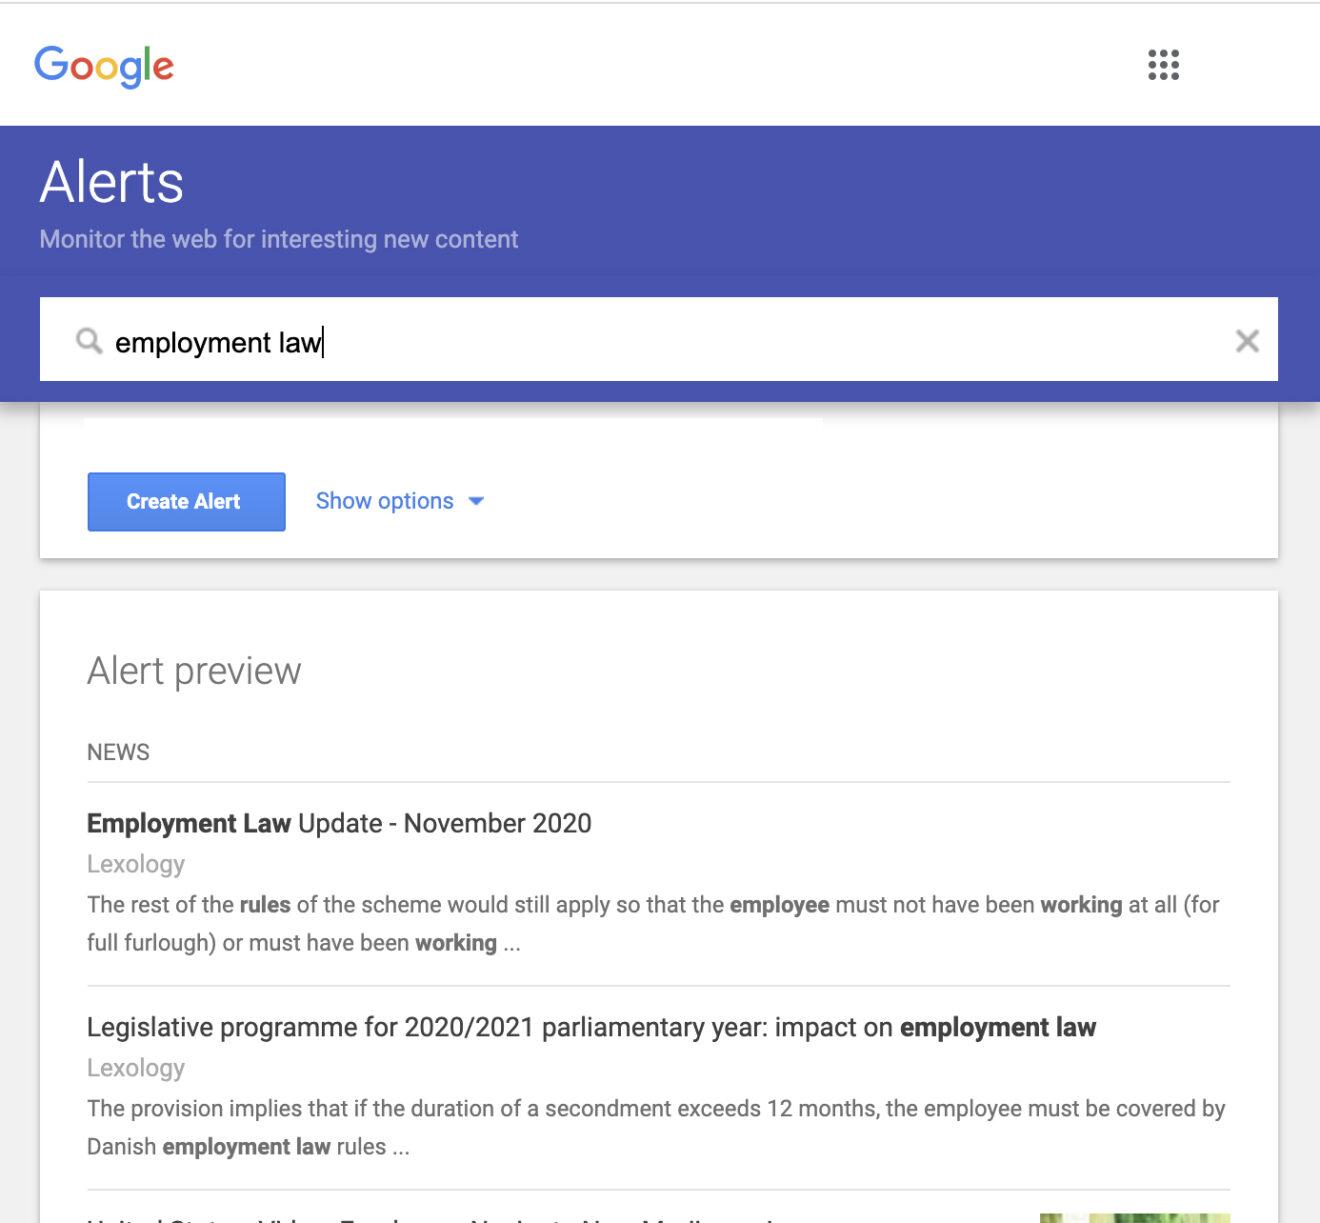 Google alerts on employment law